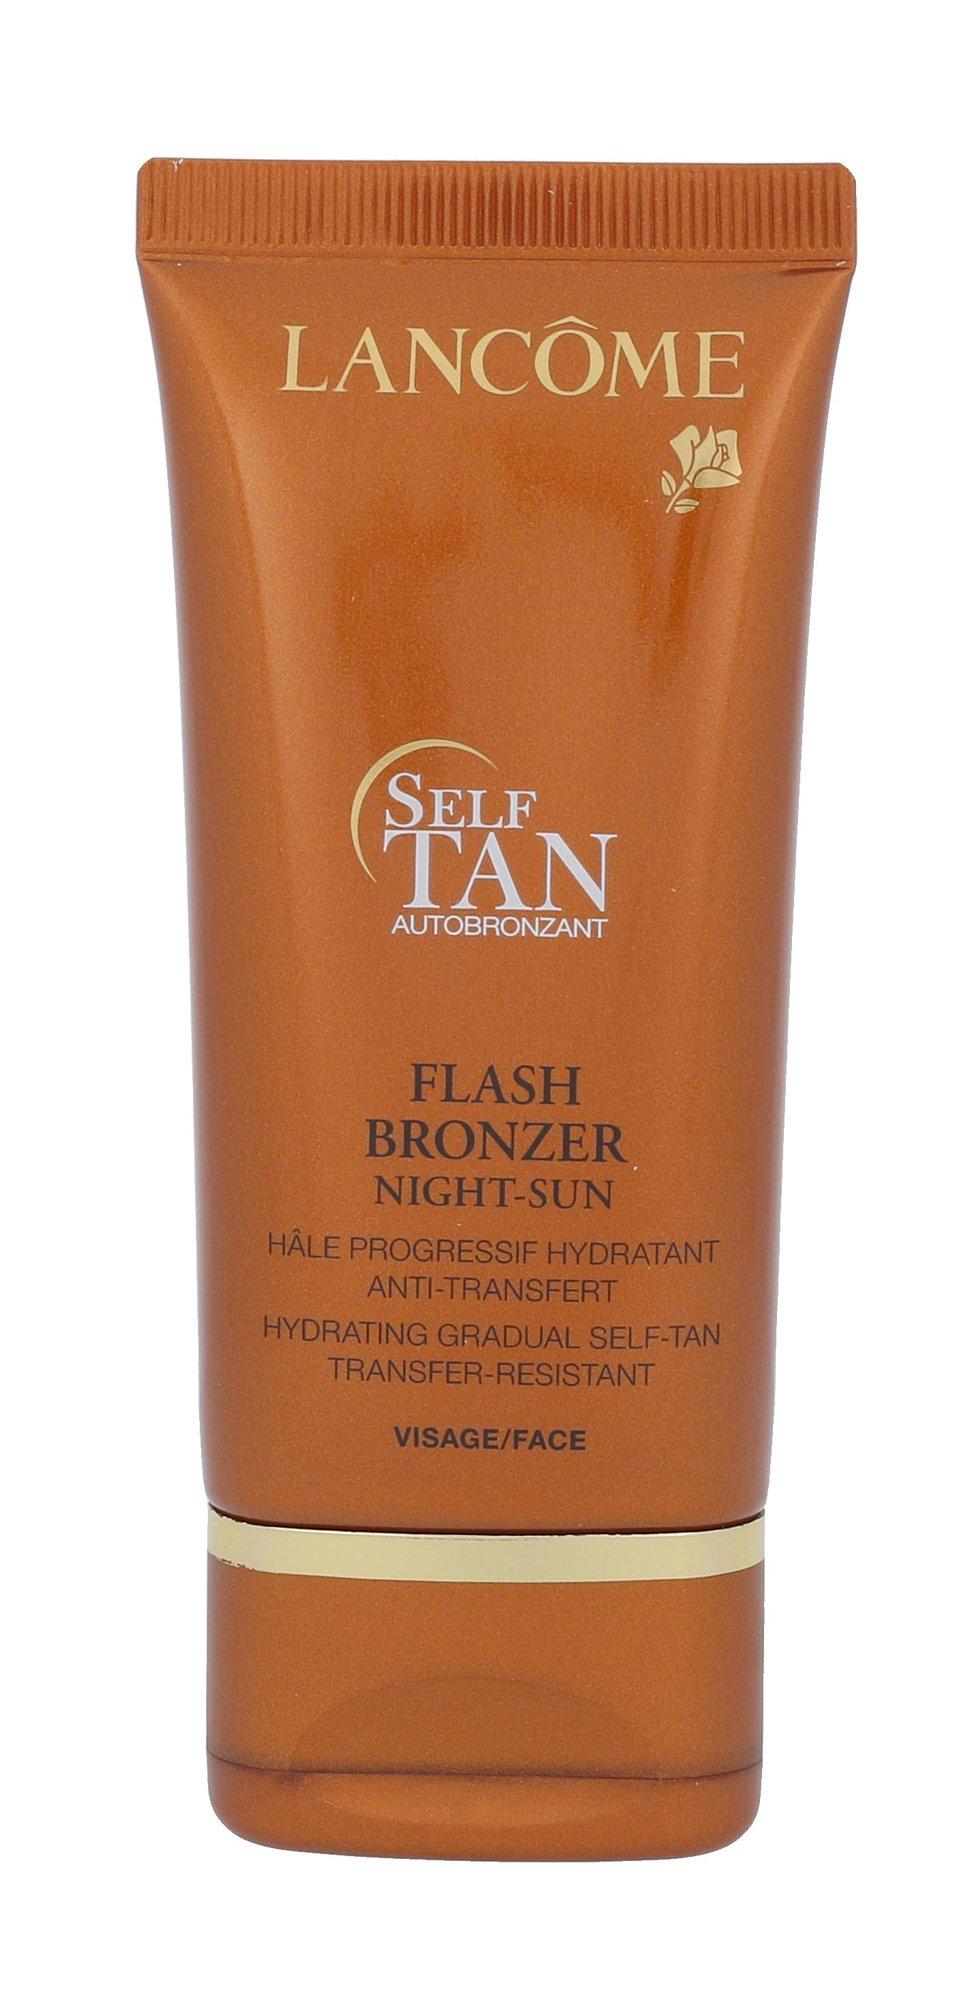 Lancôme Flash Bronzer Cosmetic 50ml